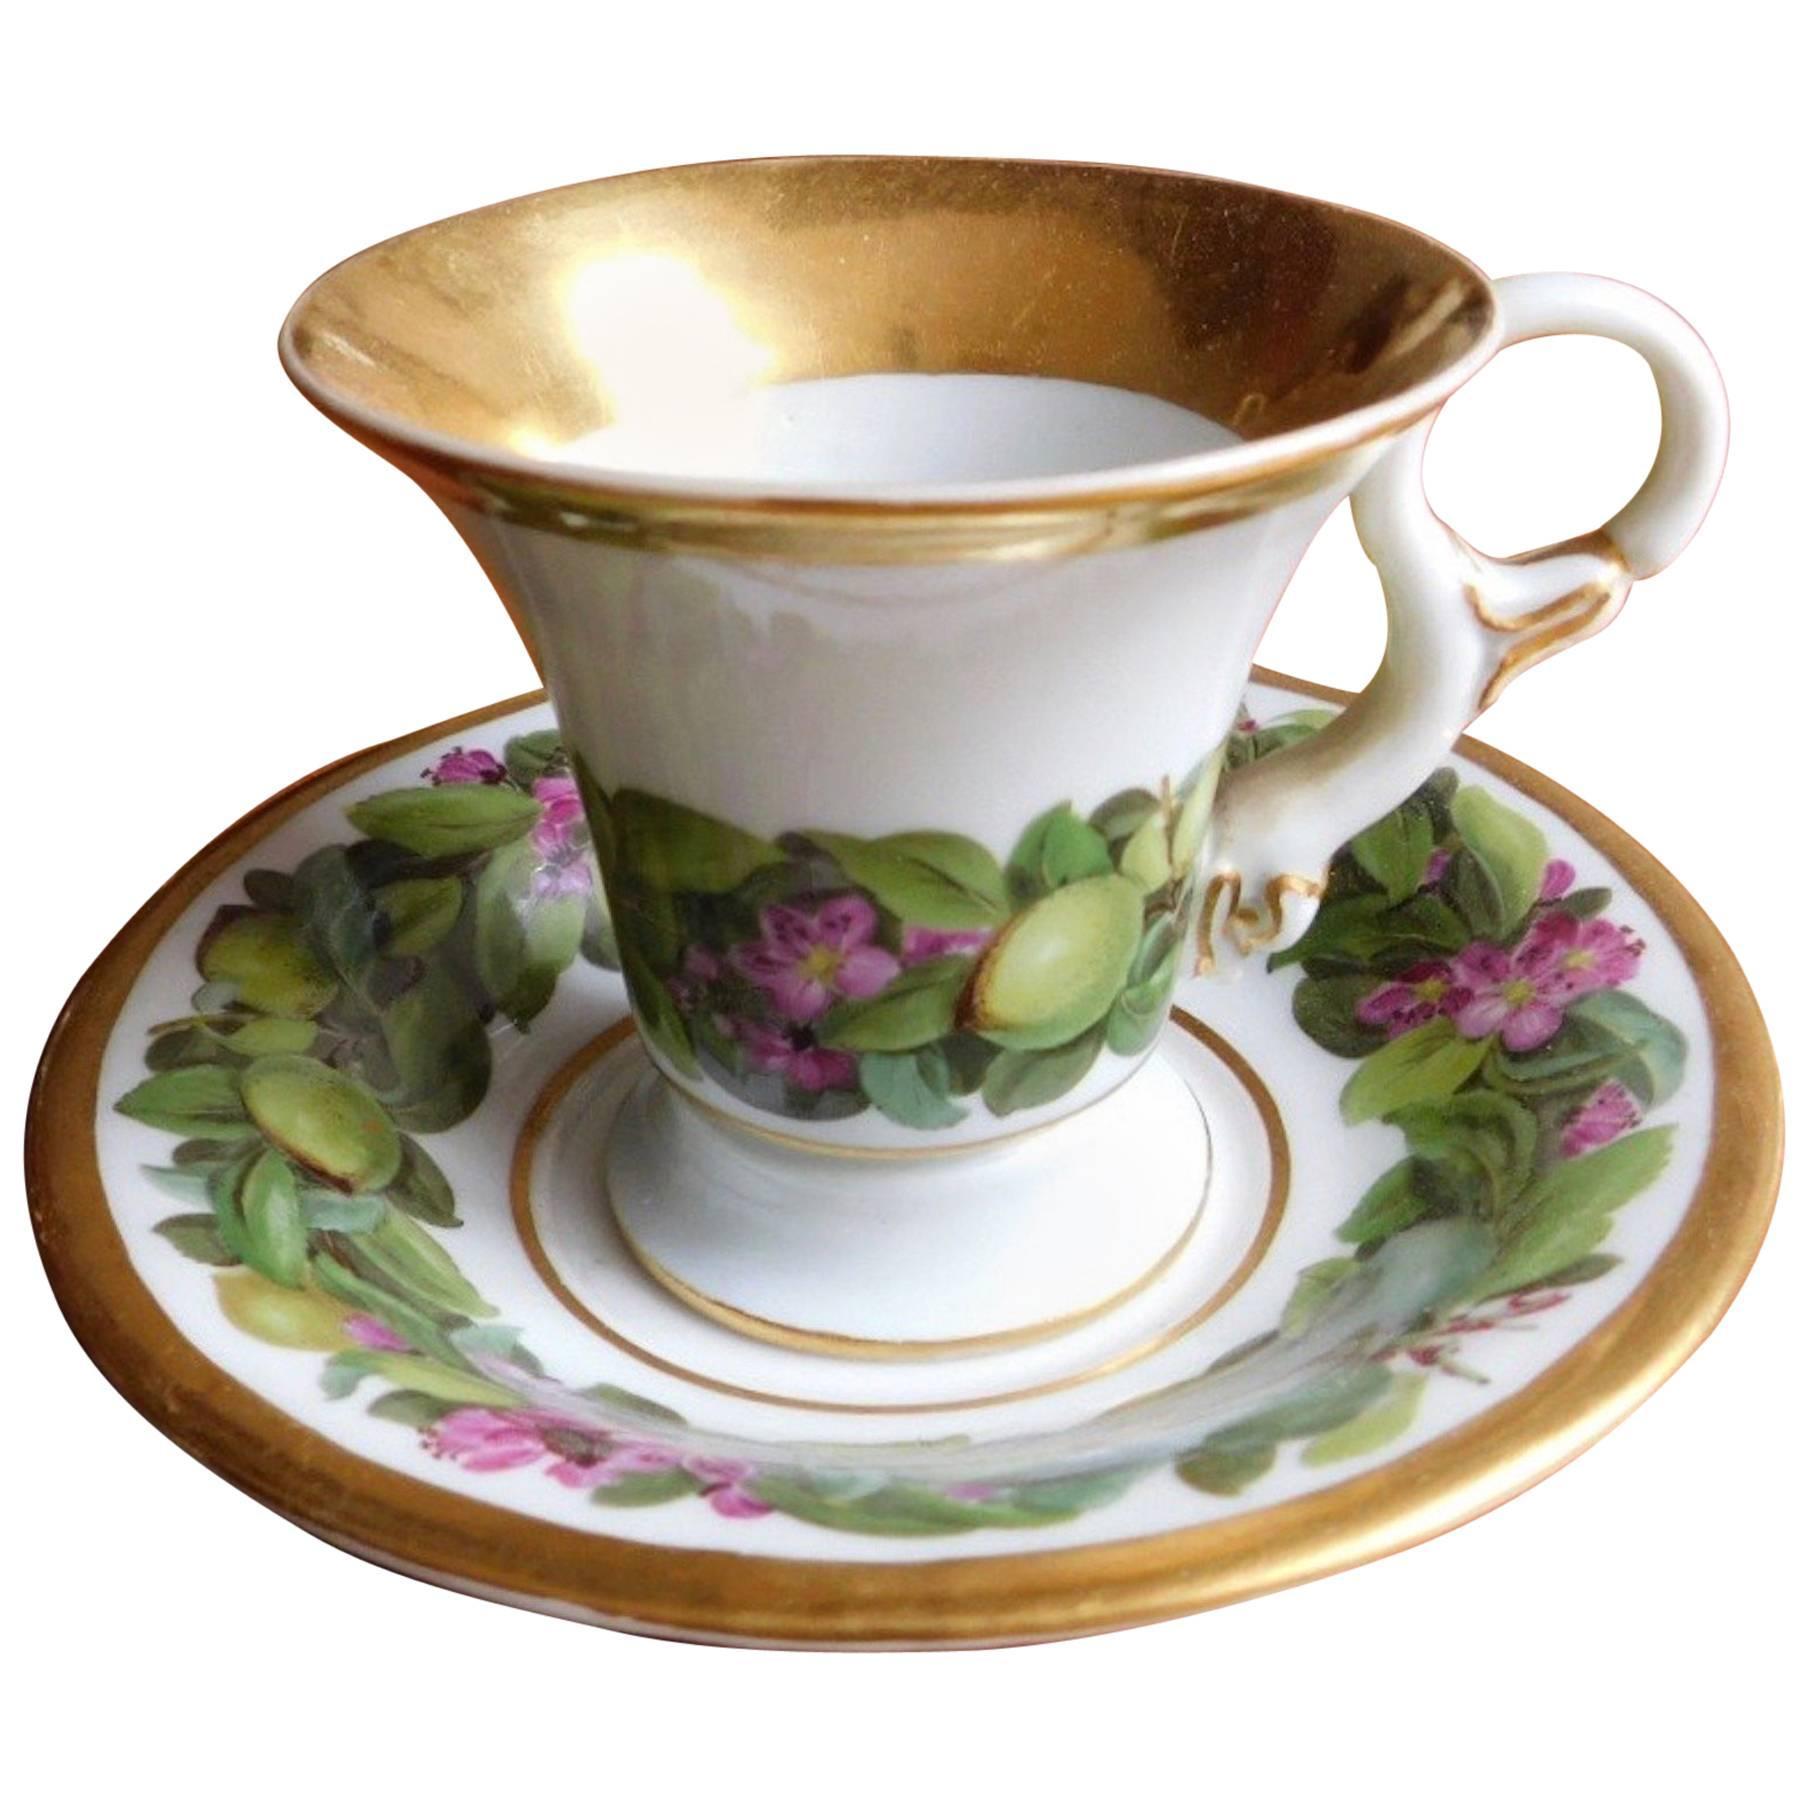 Antique 19th Century Meissen Porcelain Cup and Saucer